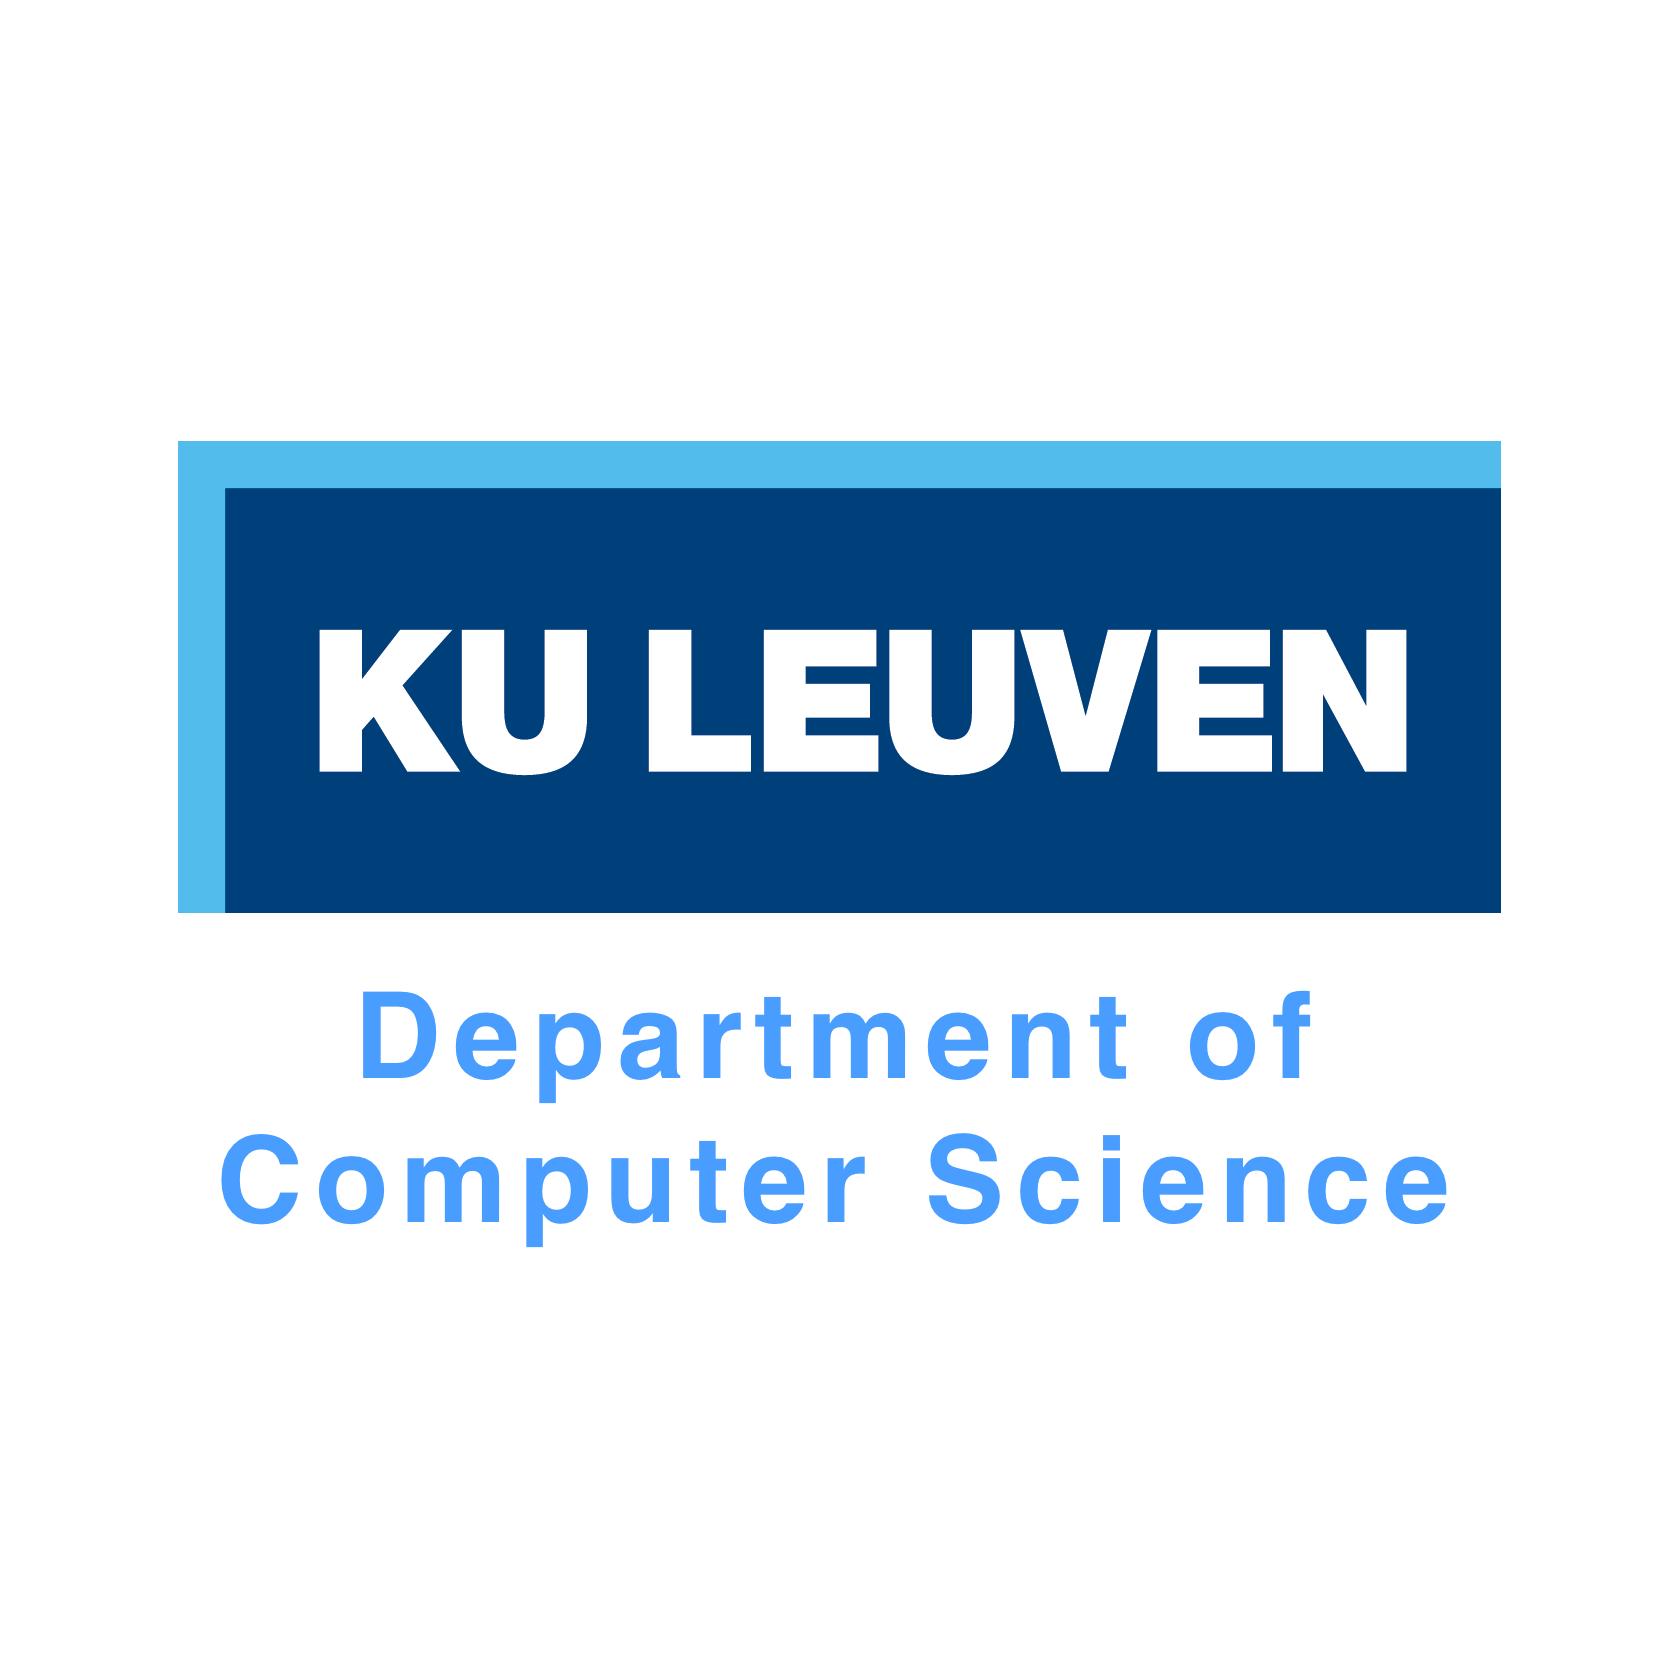 KU Leuven Department of Computer Science Logo